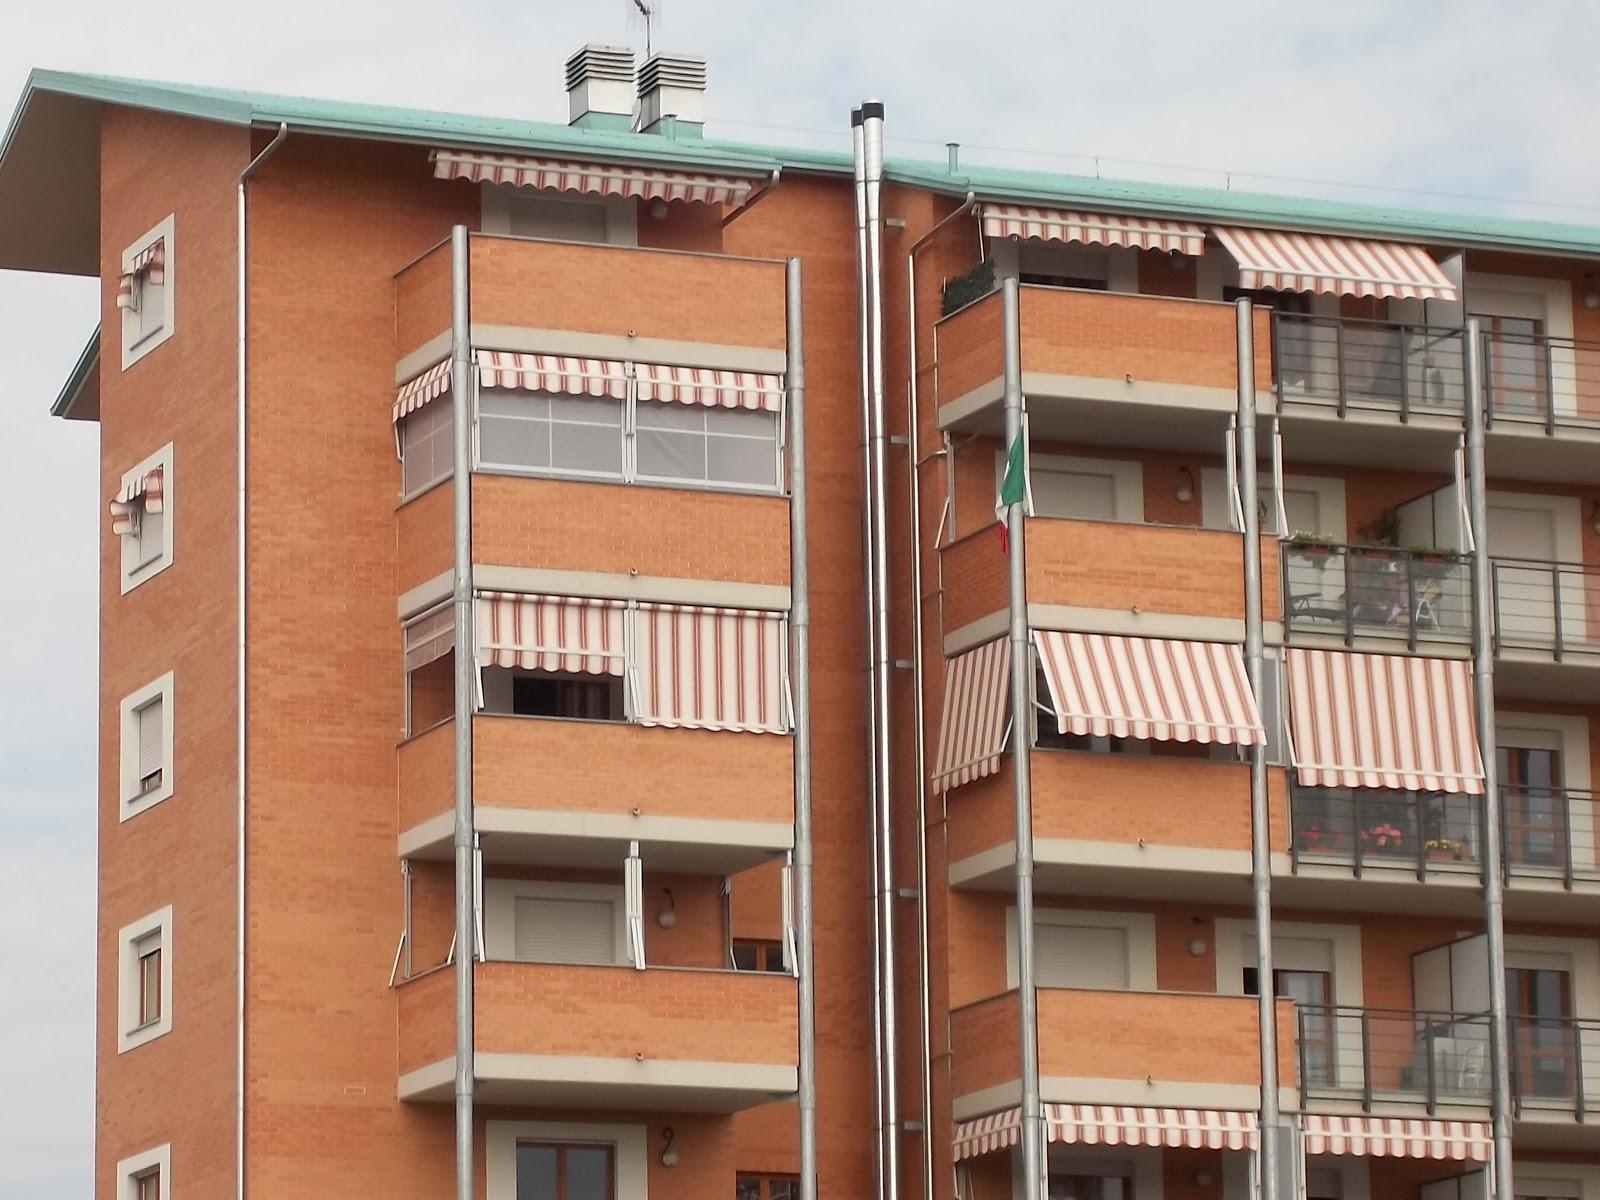 Tende Veranda Torino : Tende da sole a torino m f forniture condominiali